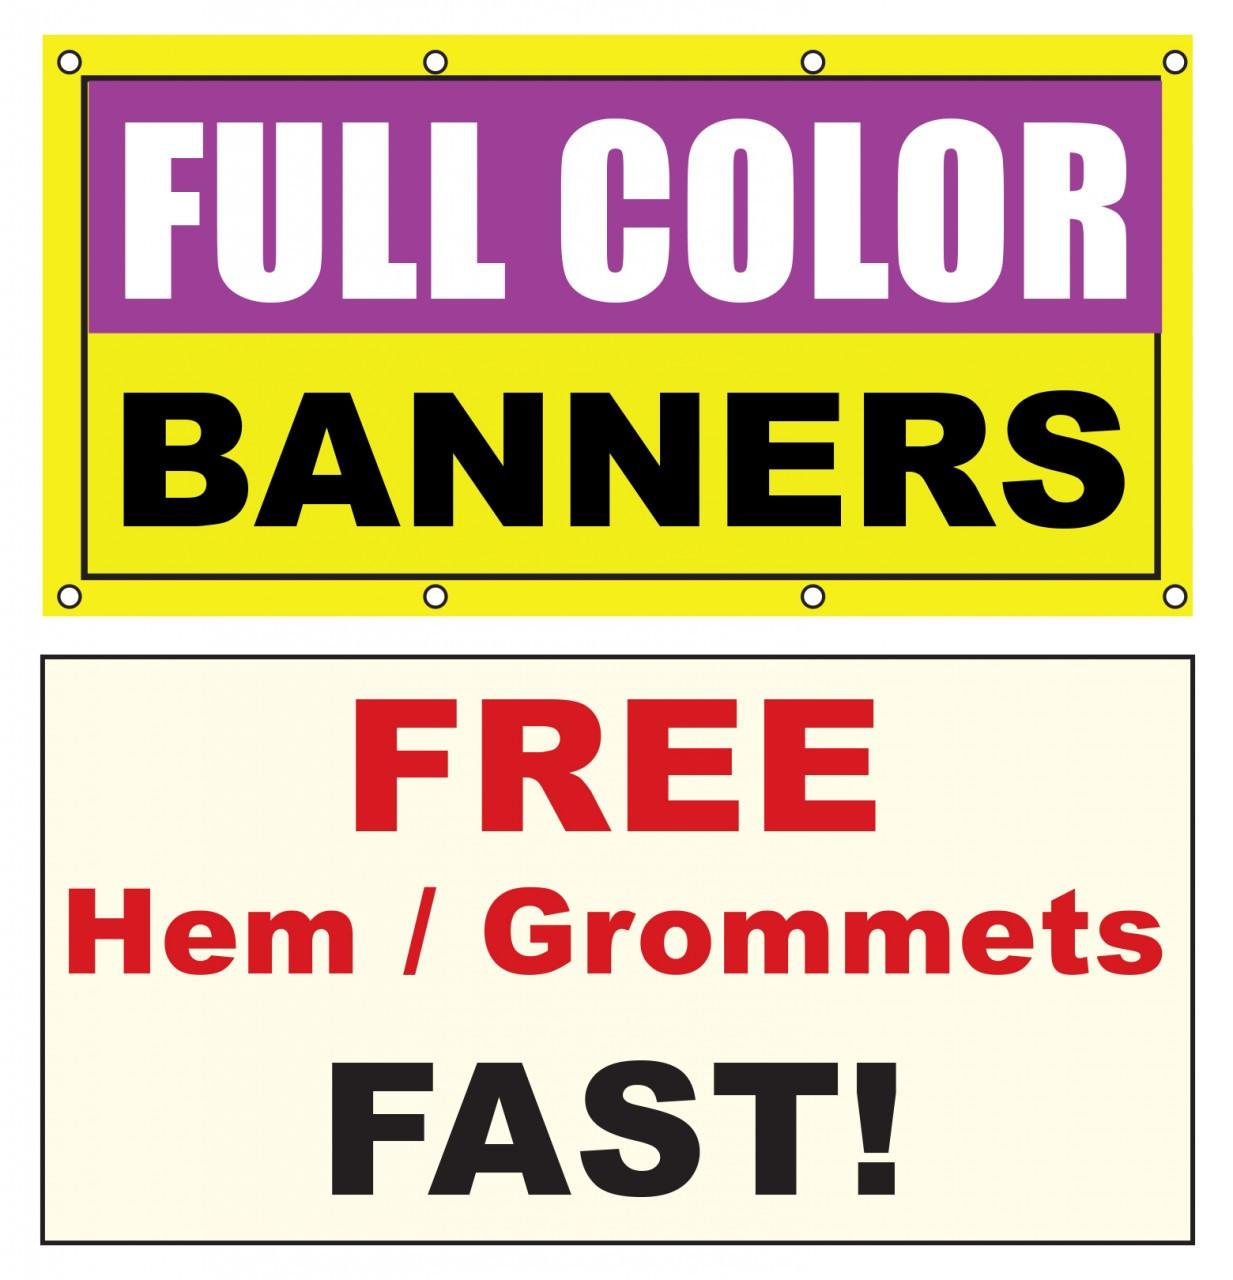 7x2 ft Vinyl Banner Custom Printed | DPSBanners com